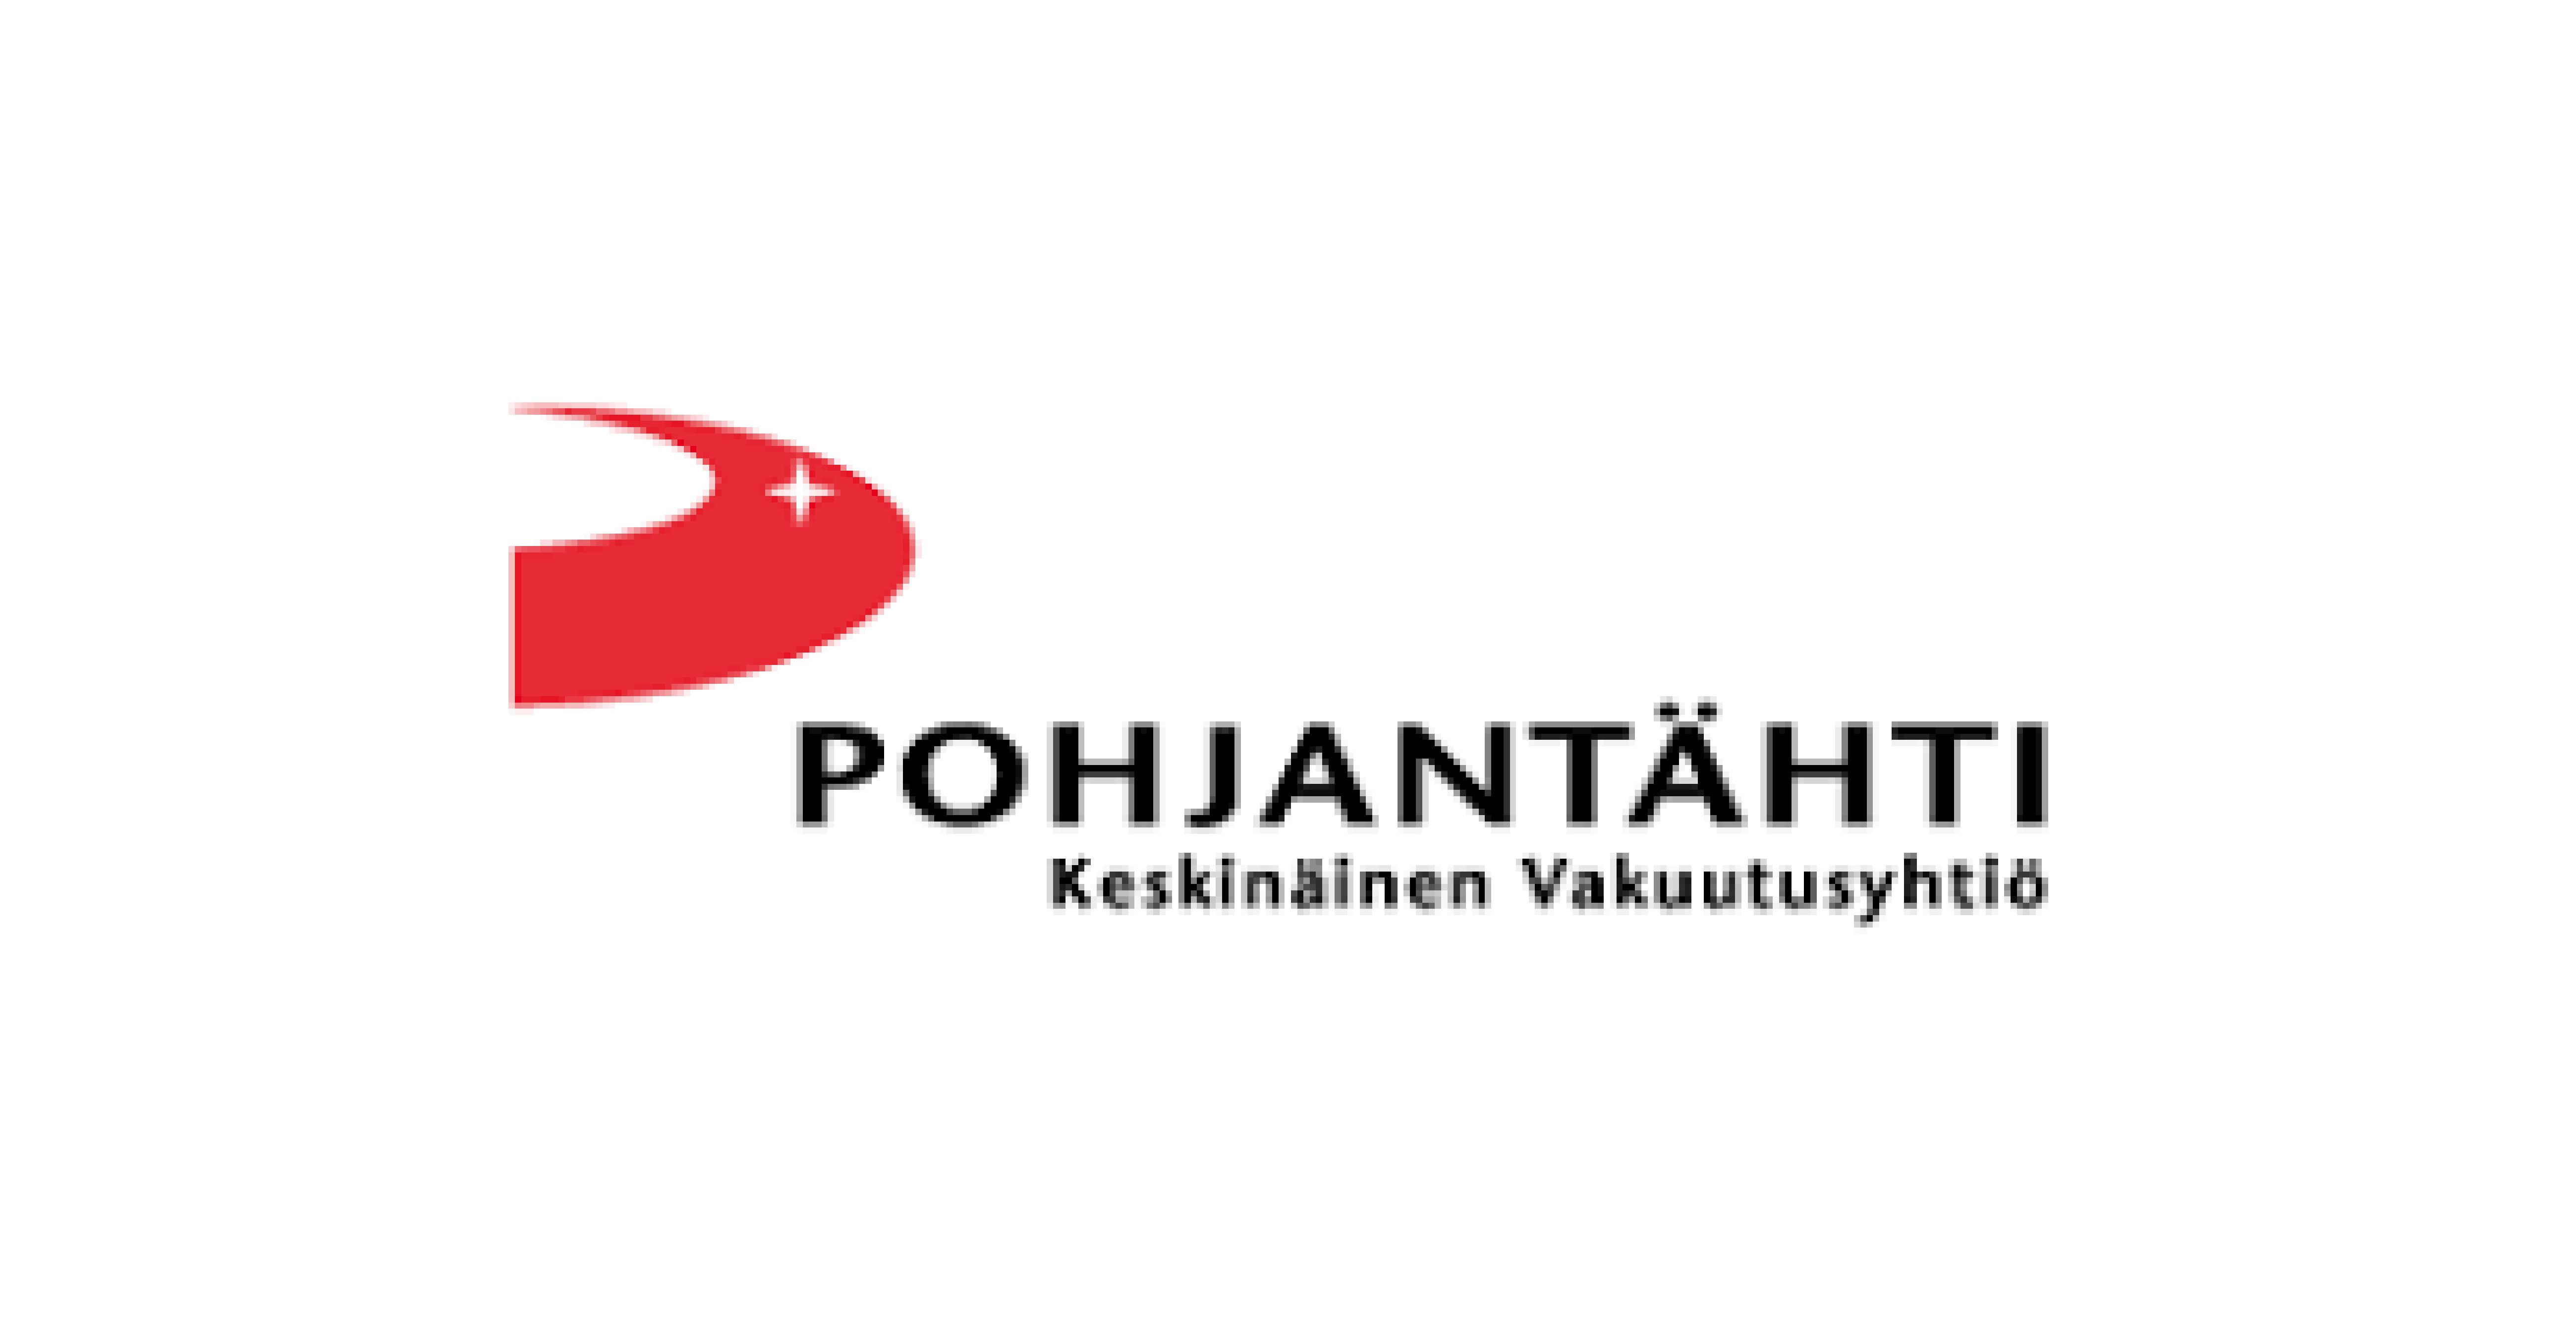 Pohjantahti_440x225_large-01